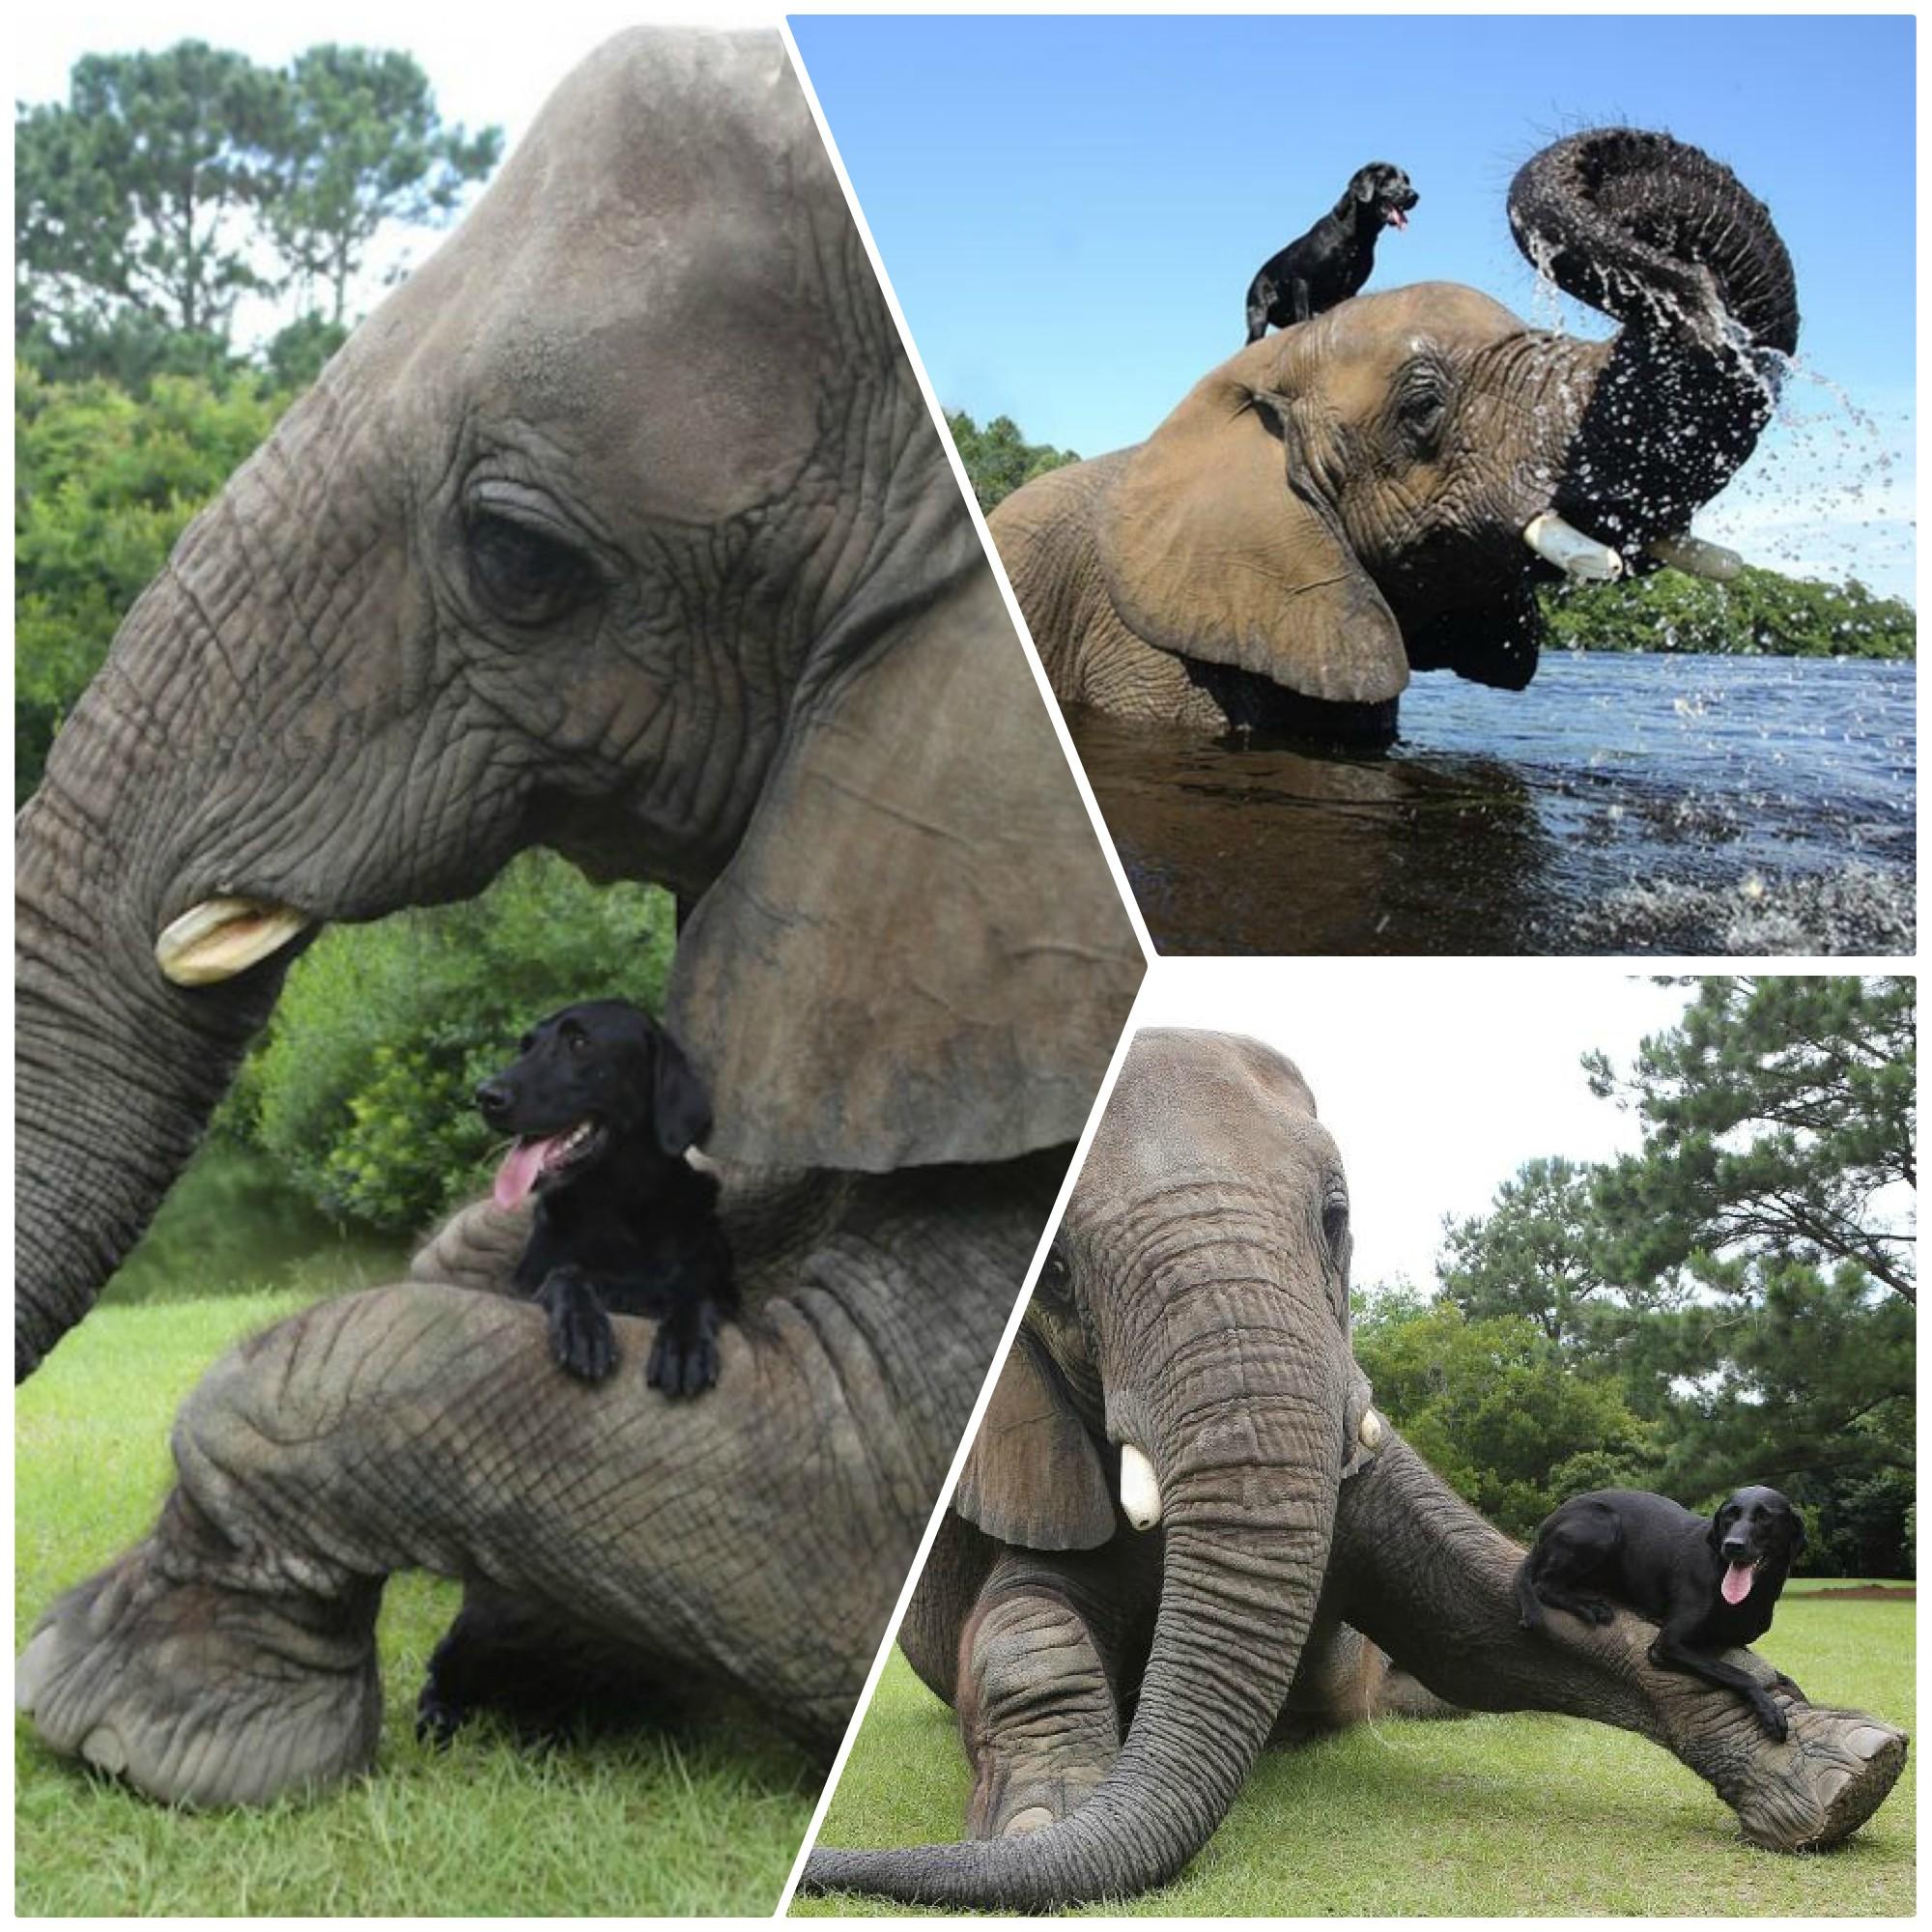 slon i pas